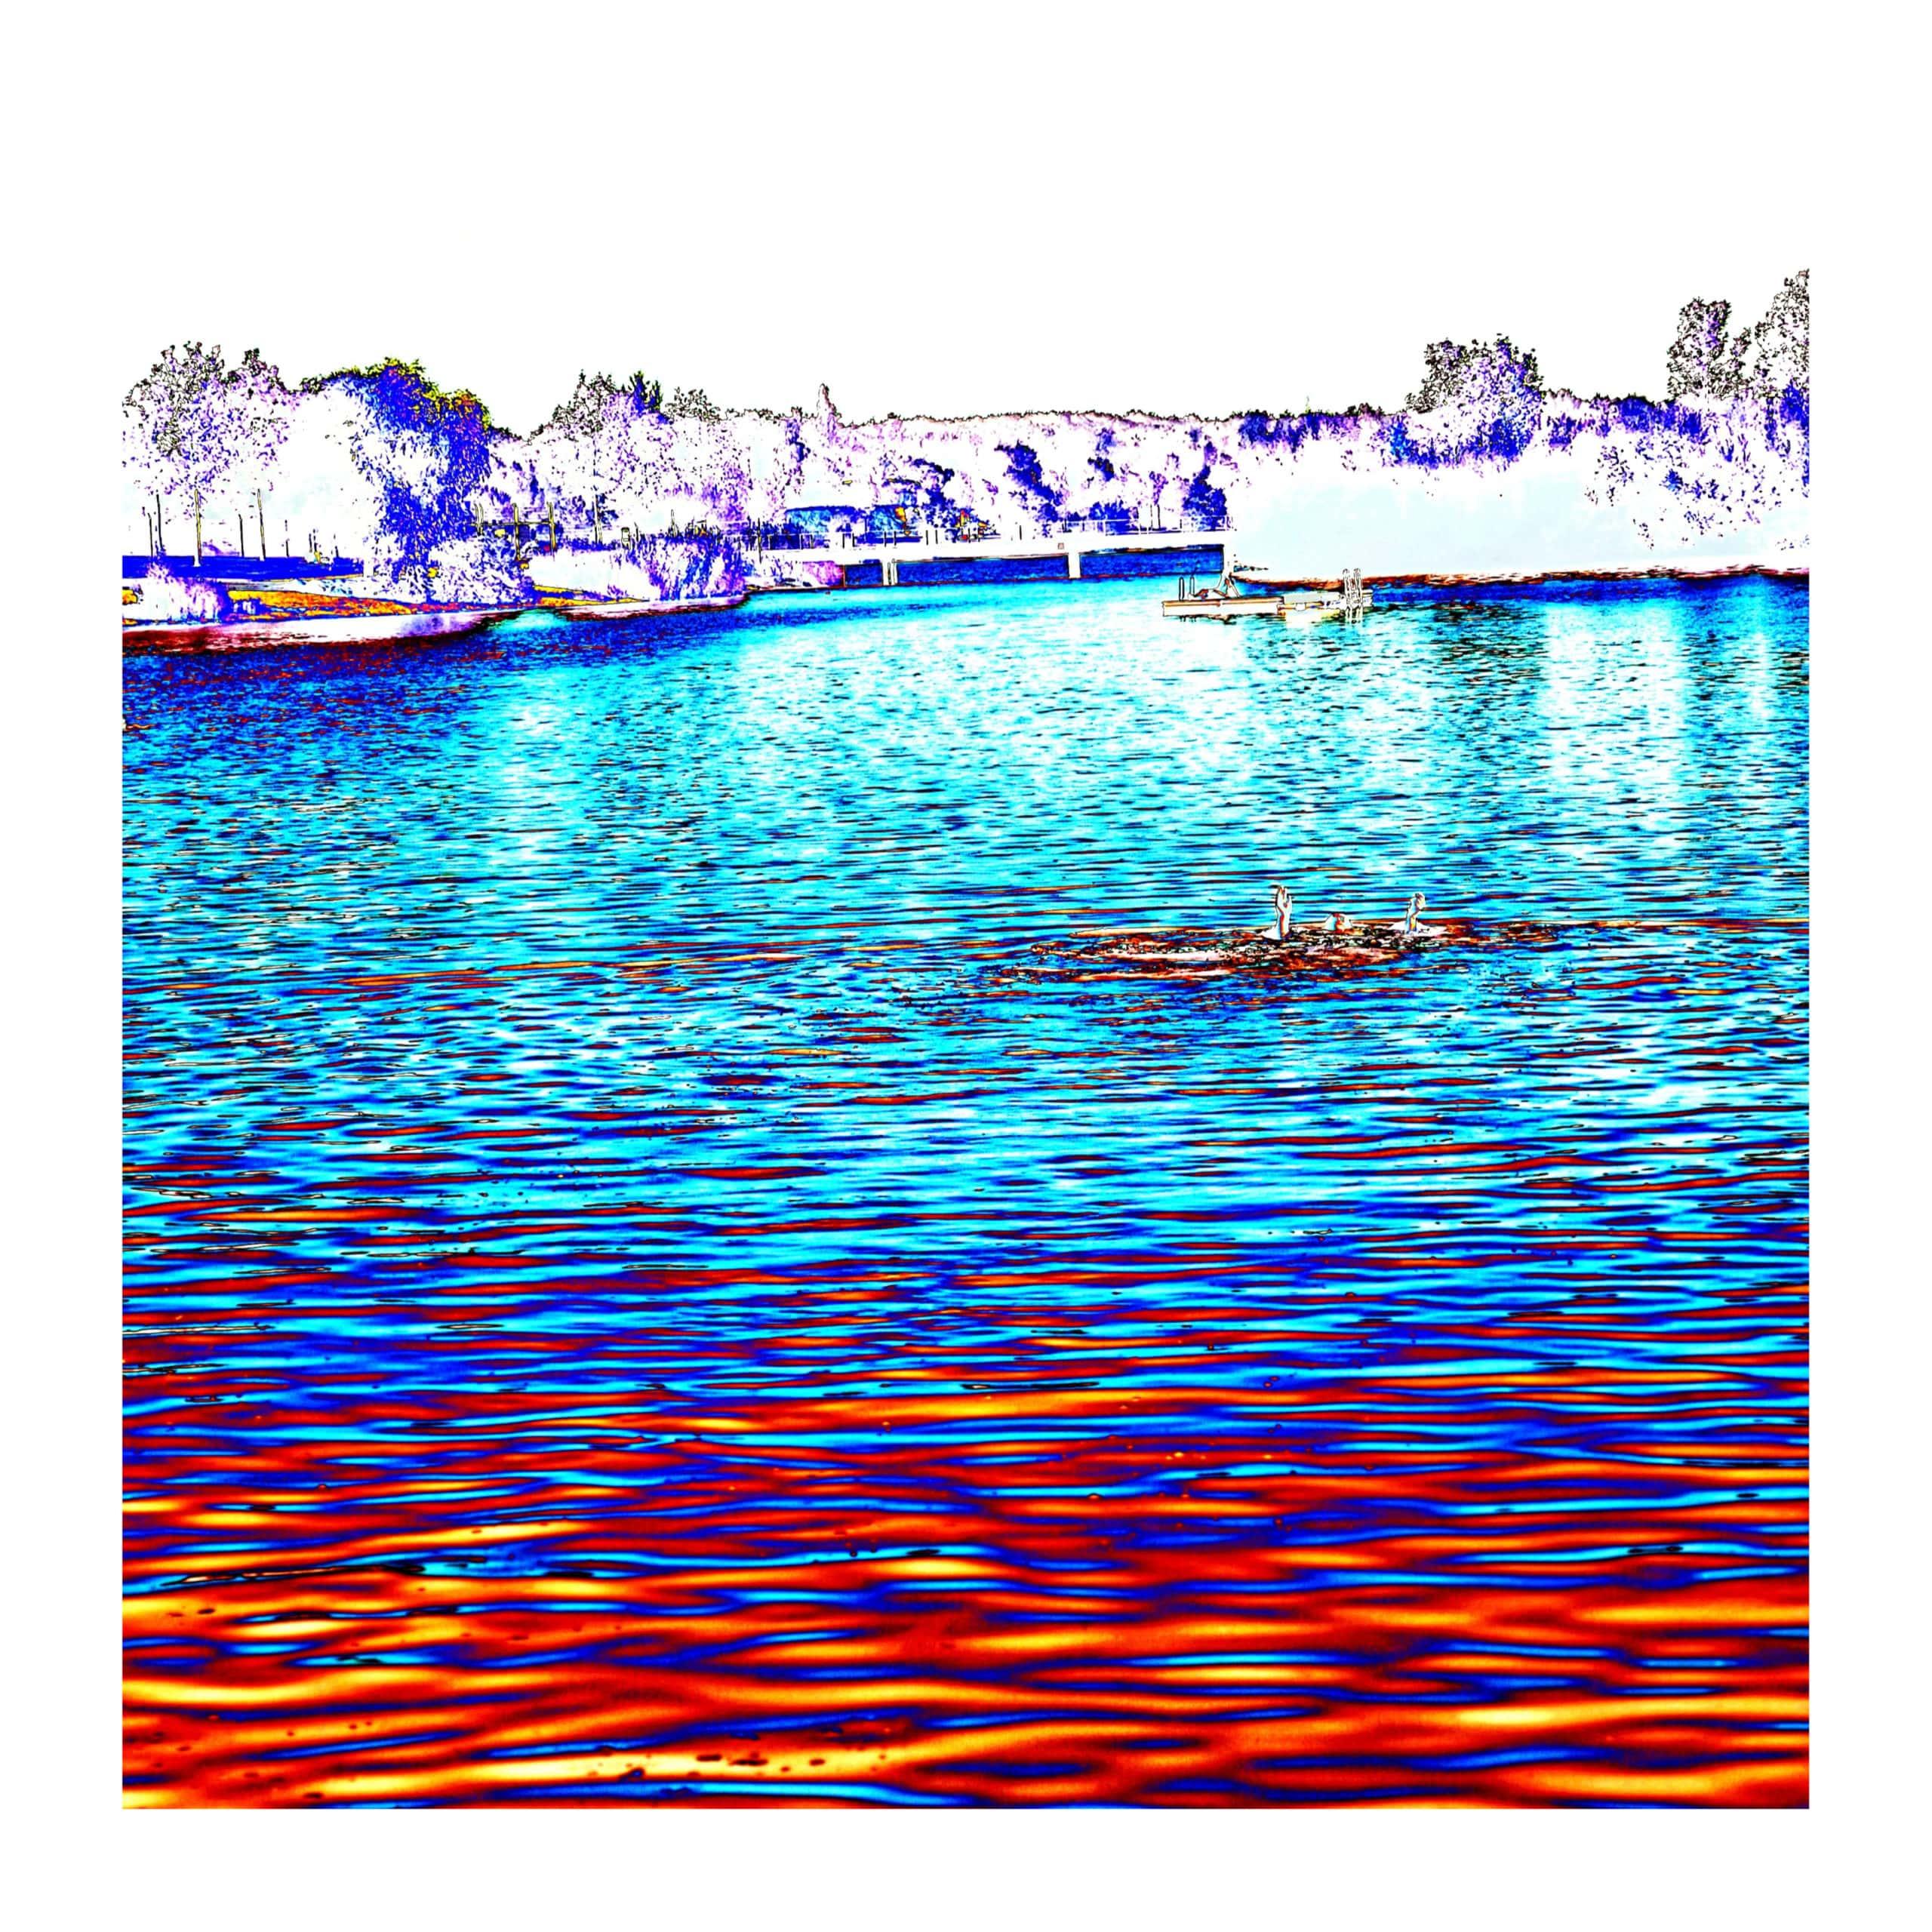 Quadratisches Format XIV- Leopoldi-Art